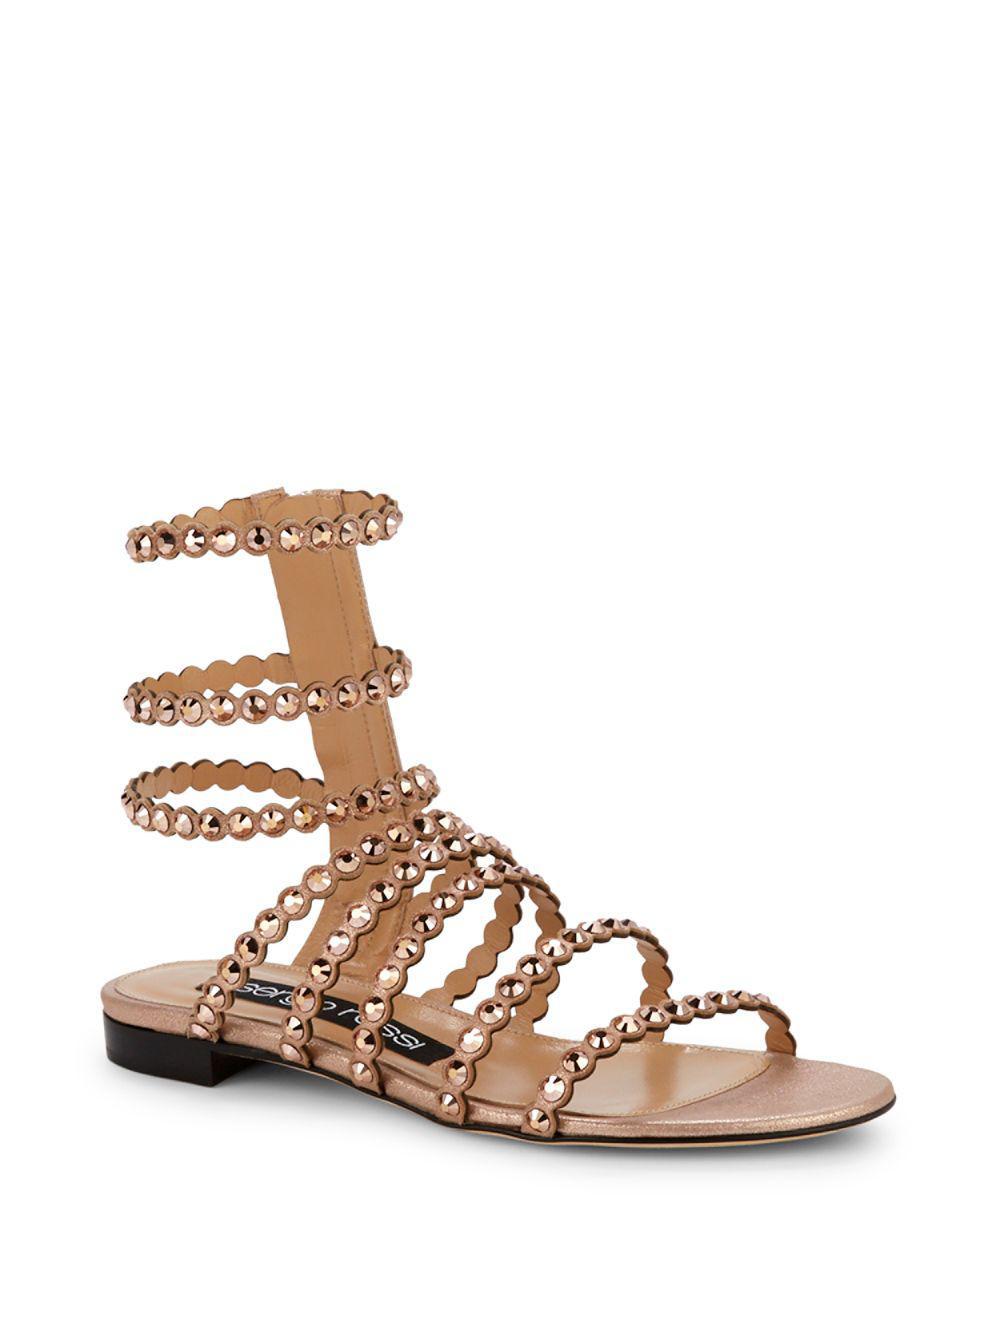 a3effbab3920 Lyst - Sergio Rossi Kimberly Suede   Jewel Gladiator Sandals - Save 10%